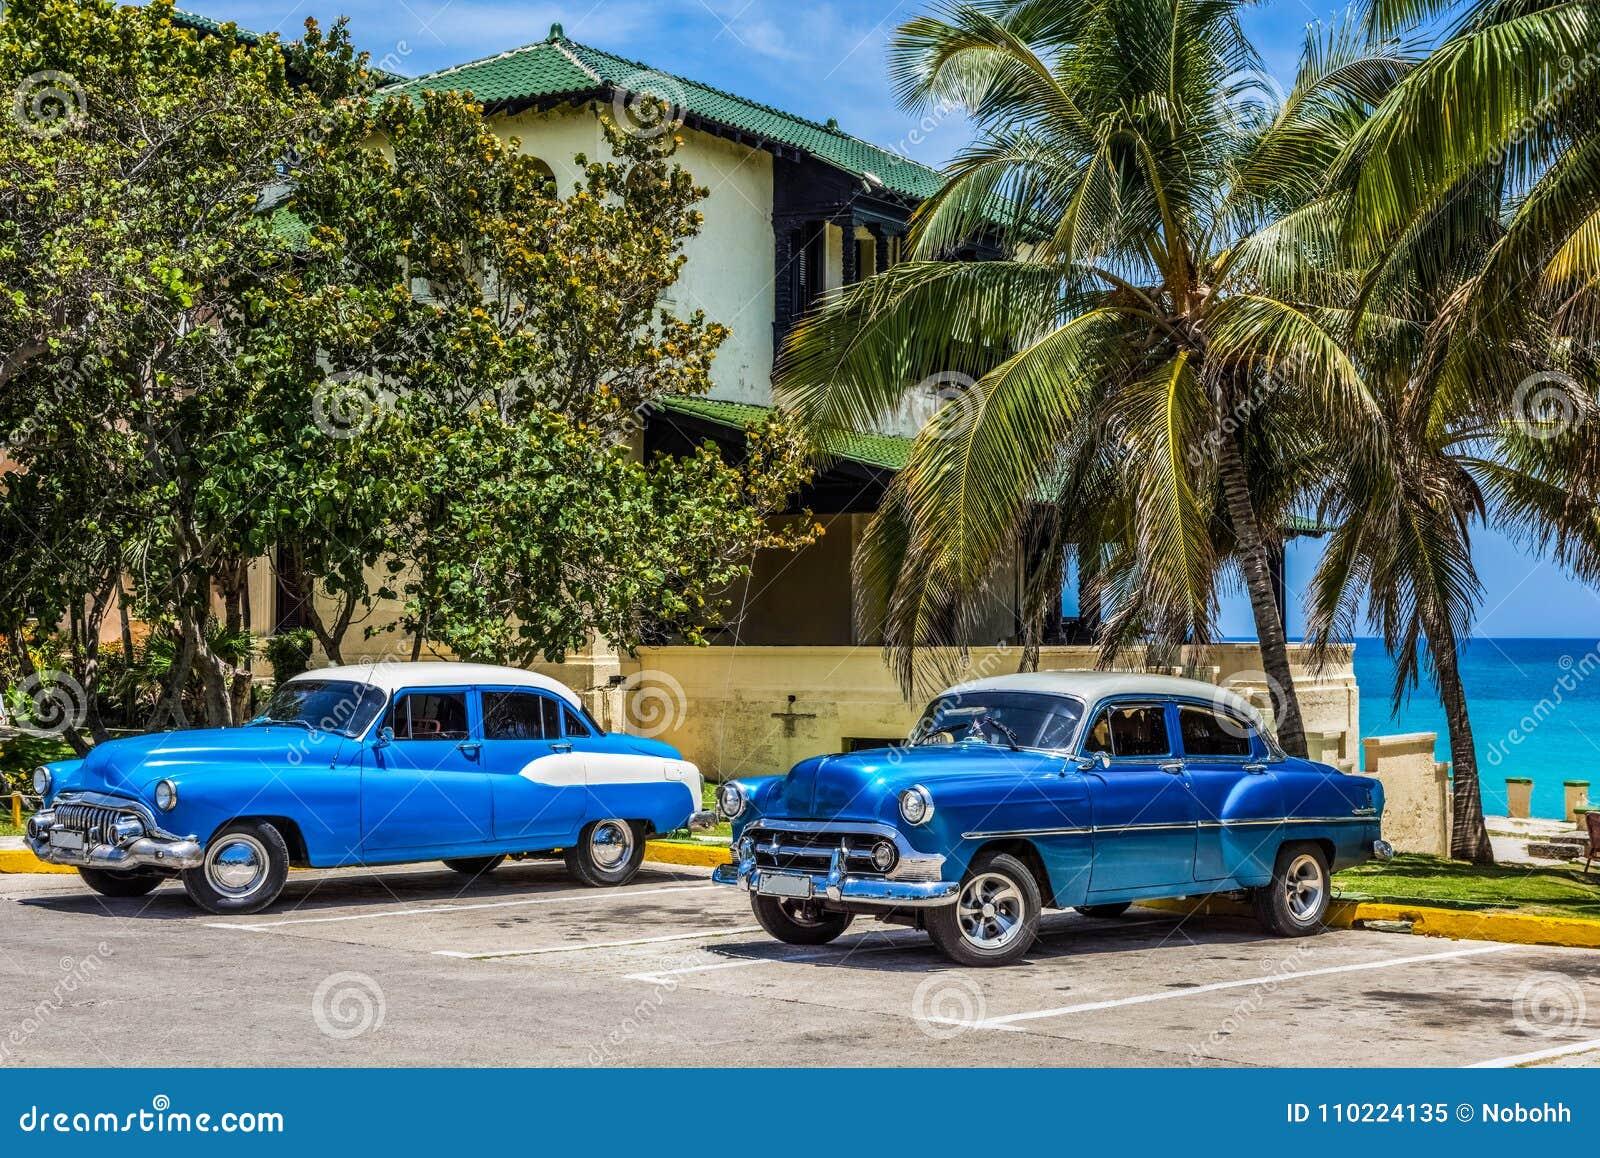 HDR - Αμερικανικά μπλε κλασικά αυτοκίνητα με την άσπρη στέγη που σταθμεύουν στην παραλία κάτω από τους φοίνικες σε Varadero Κούβα